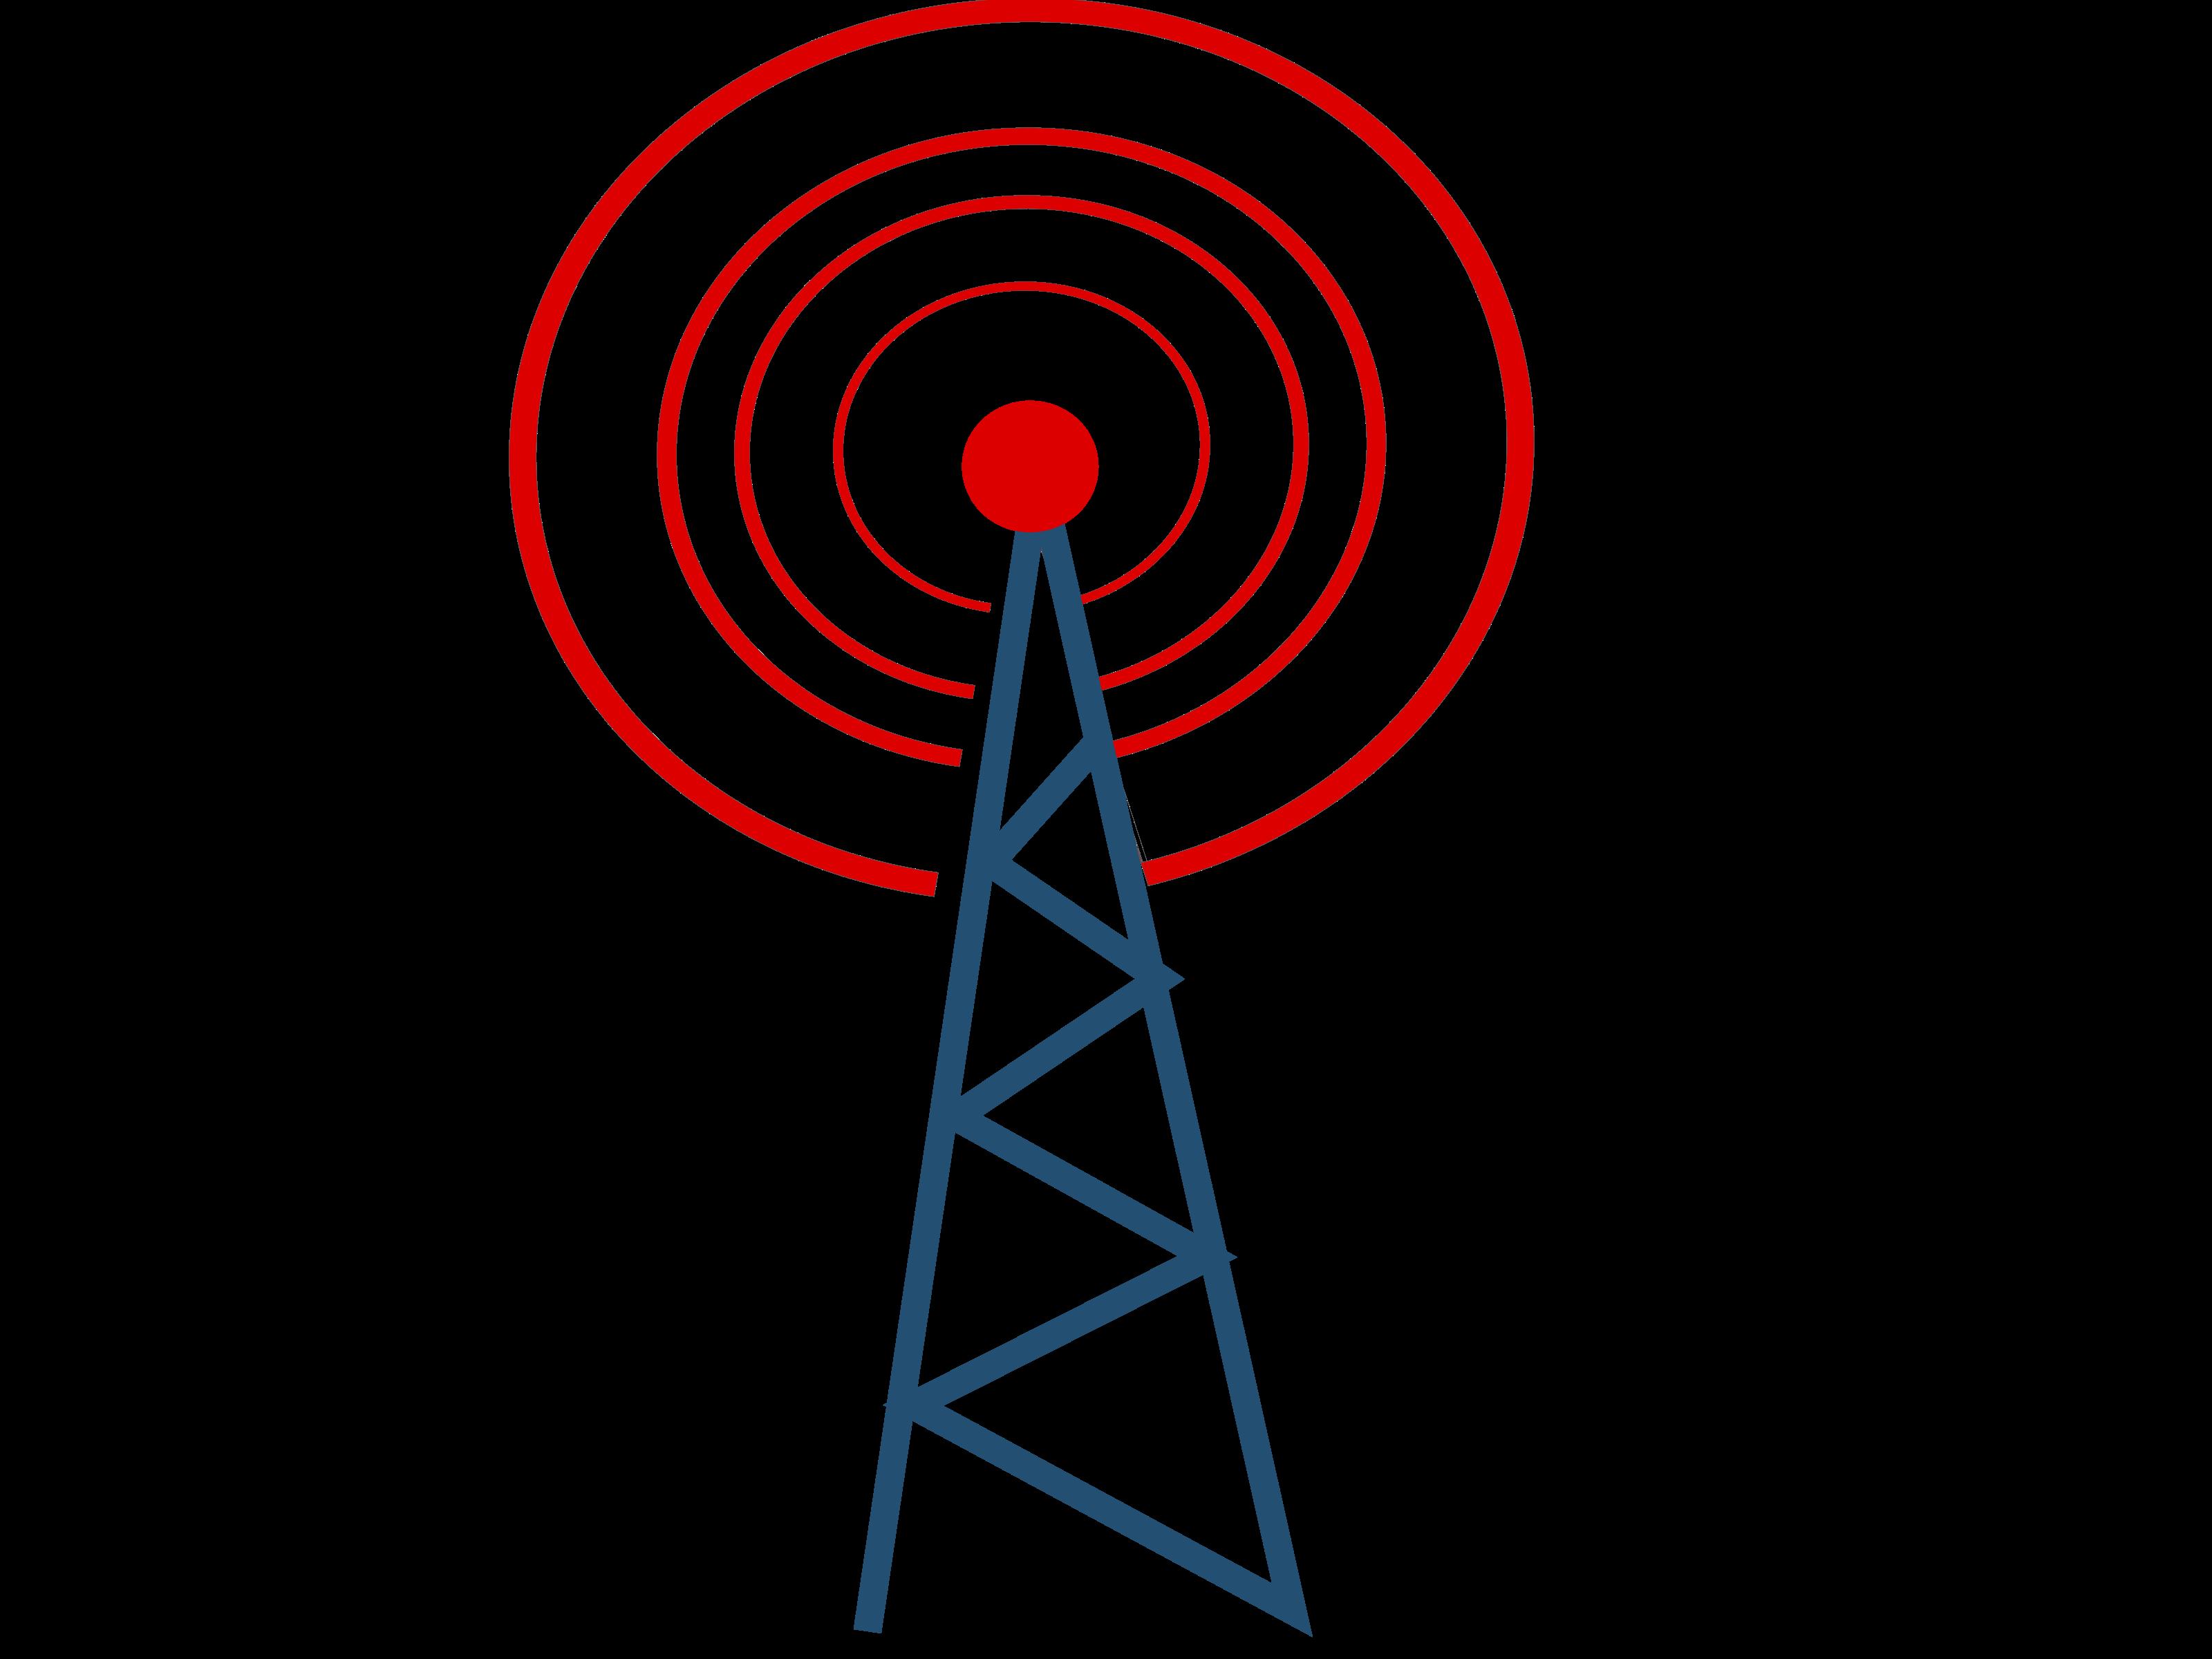 Communication clipart telecommunication. Telecom big image png